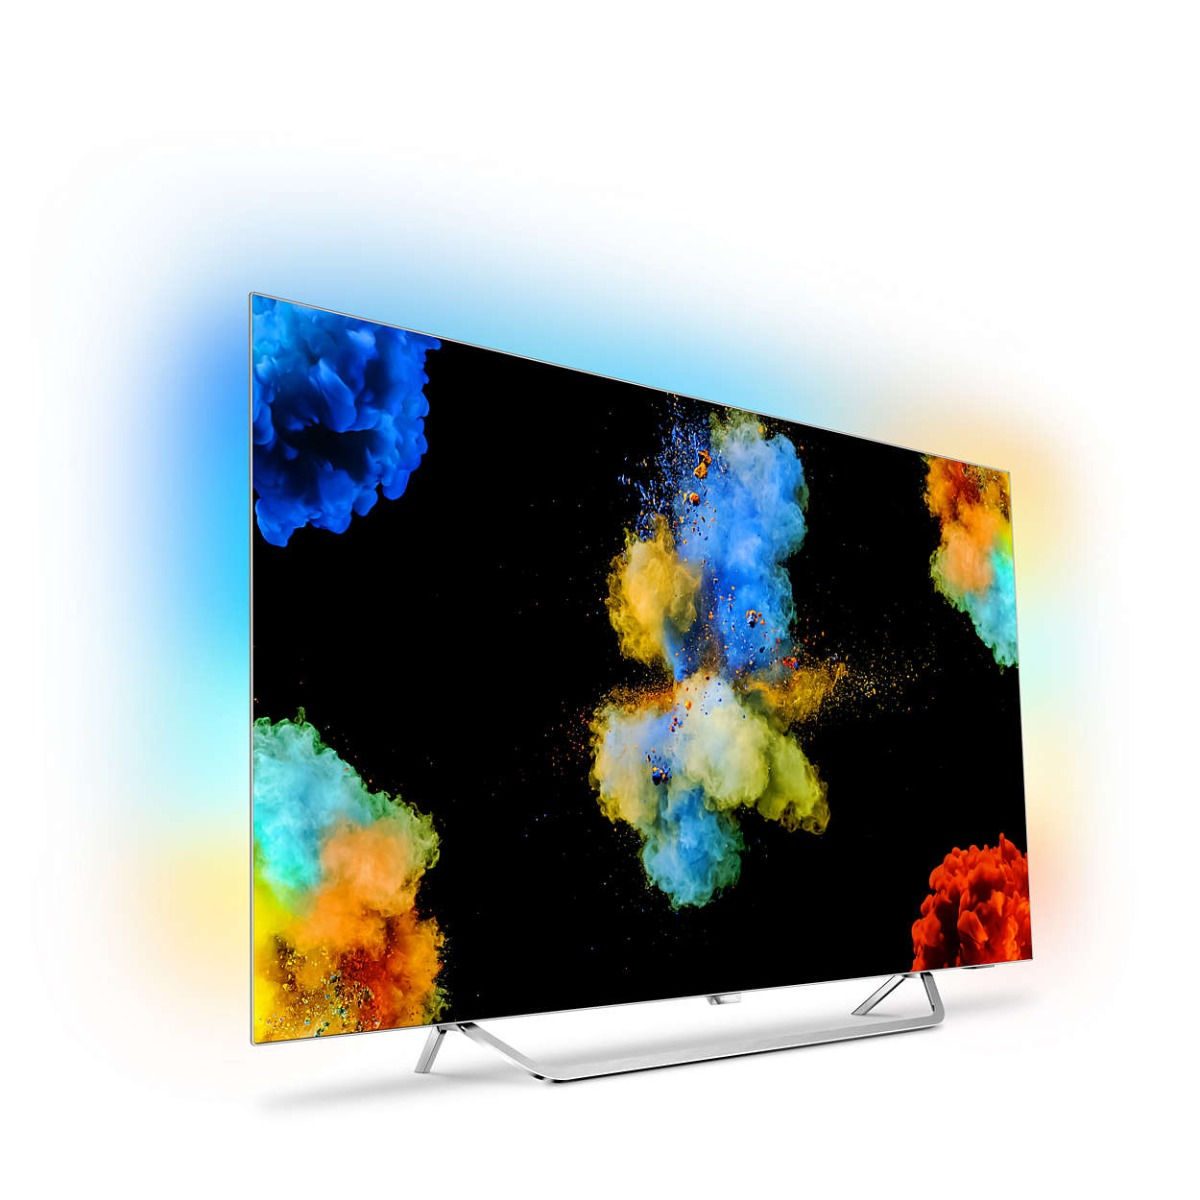 Philips 55inch/140cm OLED TV